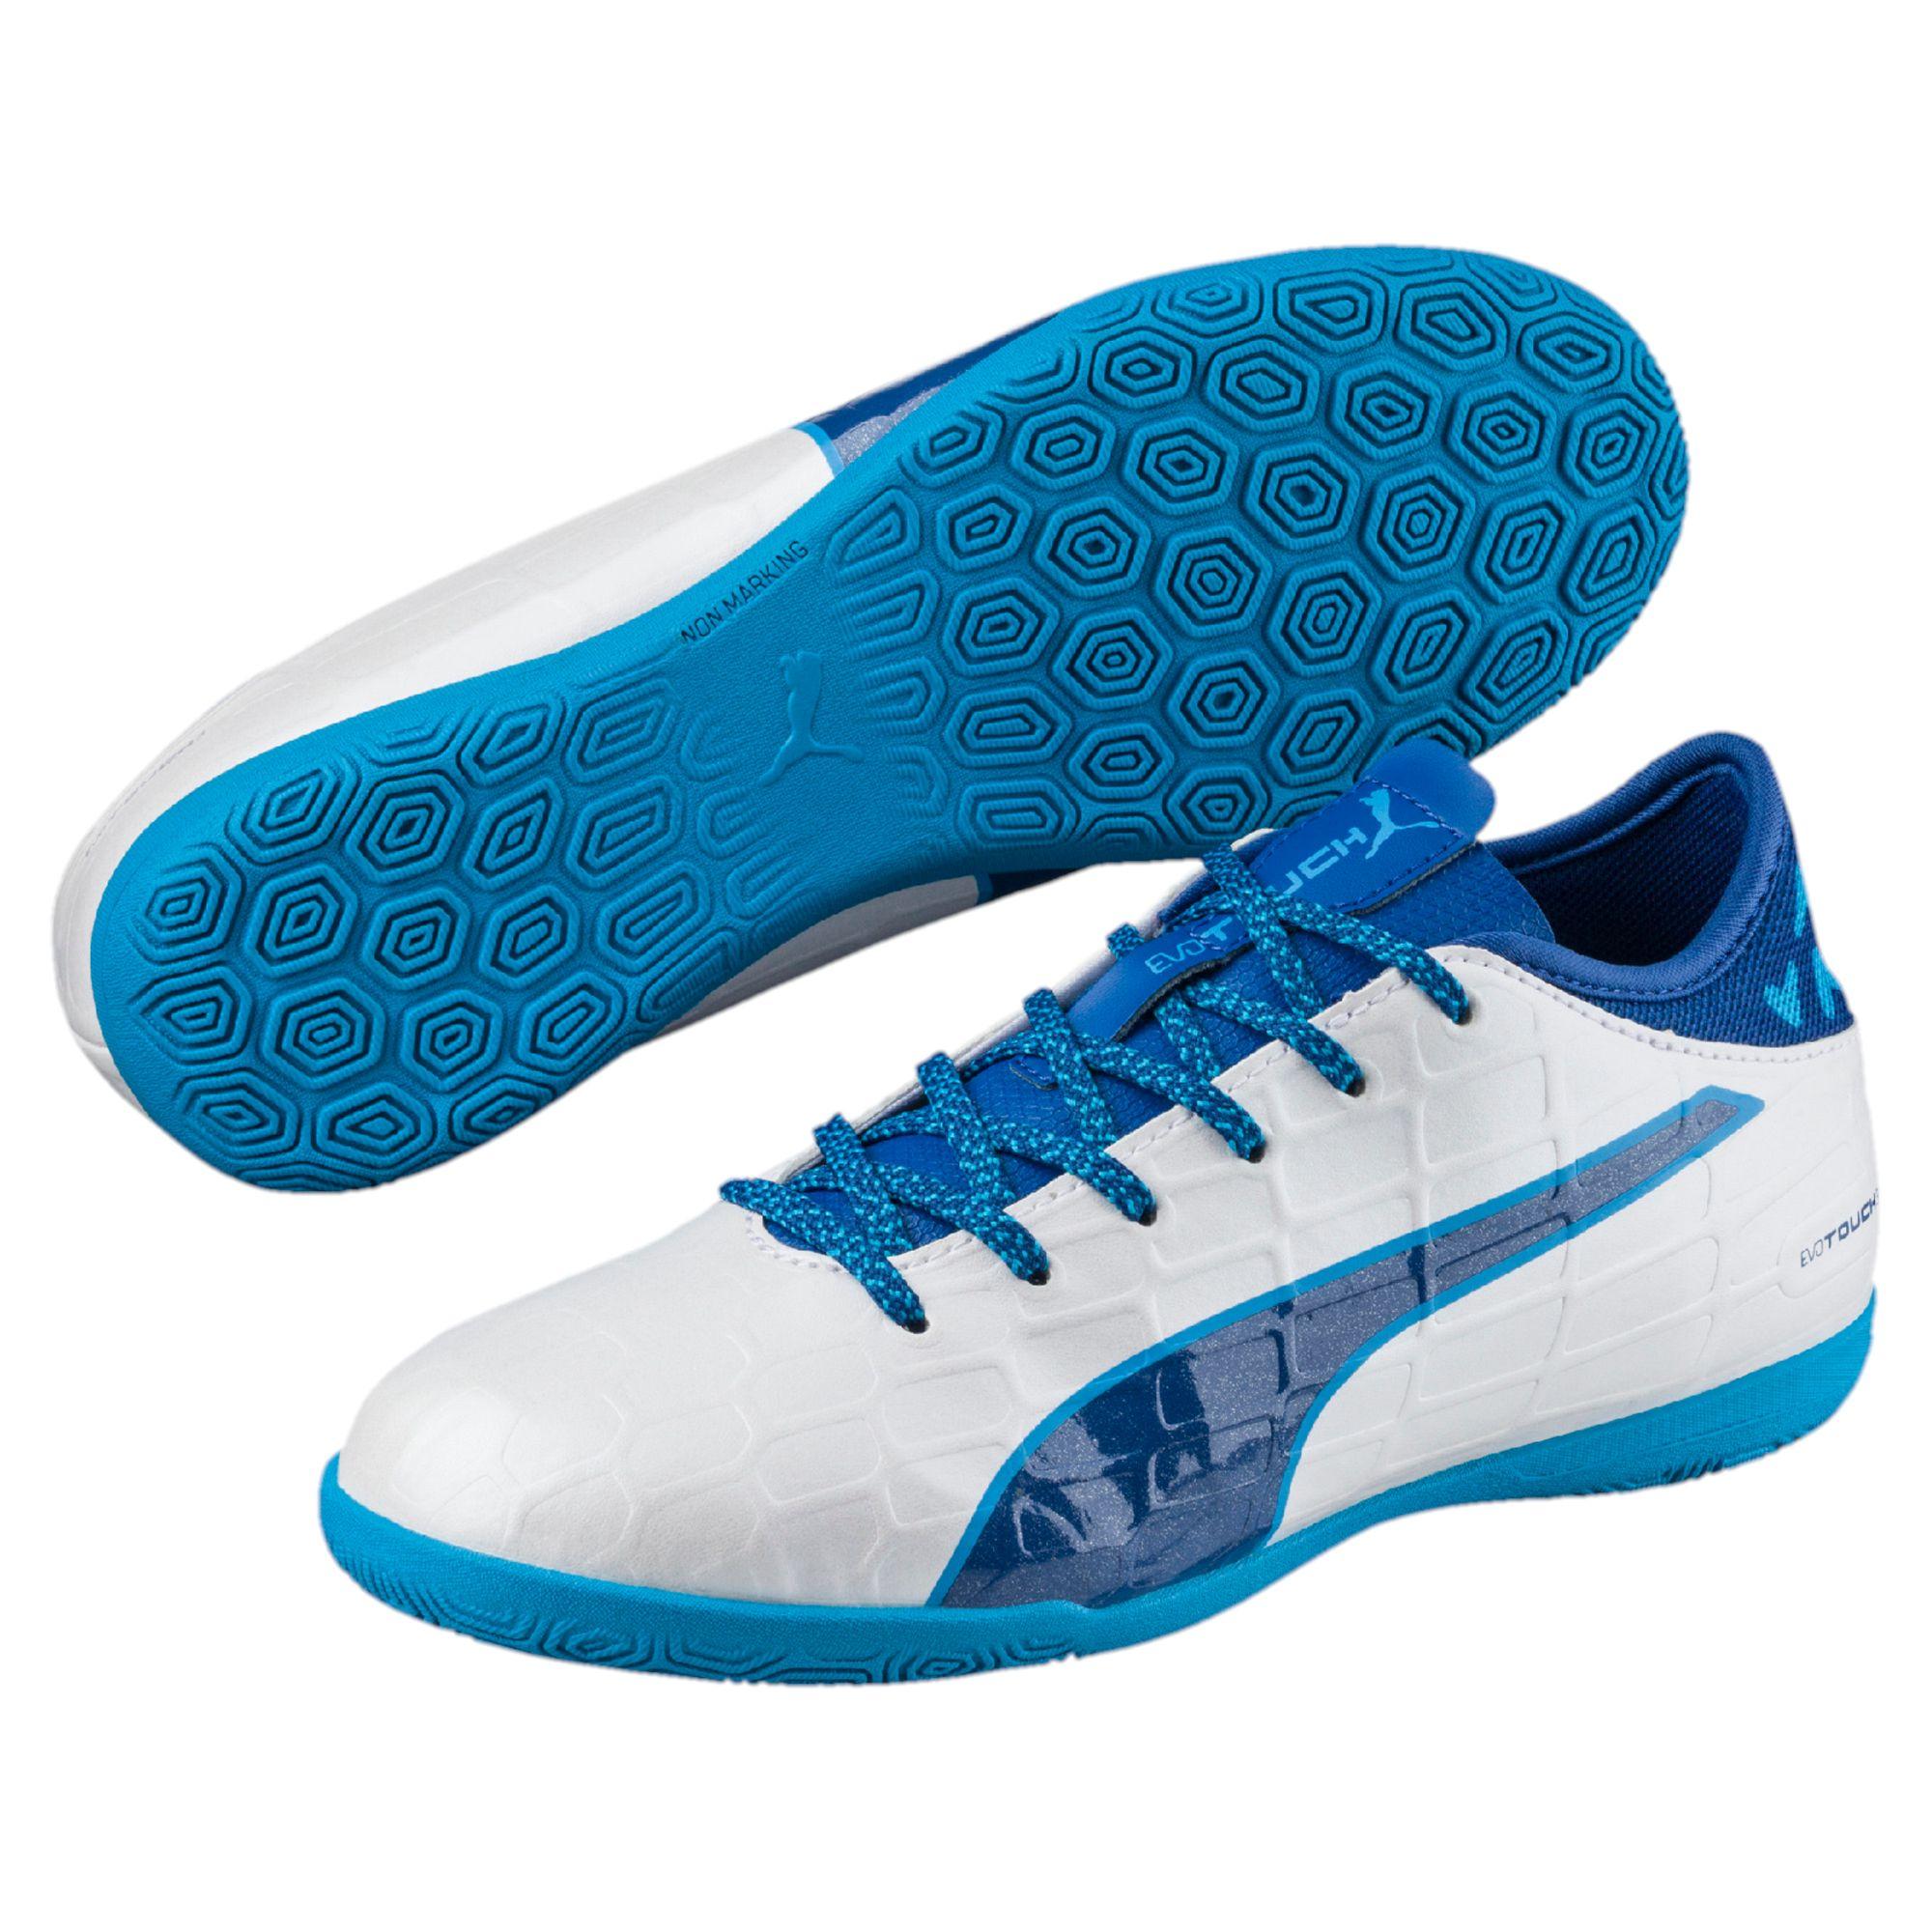 PUMA evoTOUCH 3 IT Kinder Indoor-Trainingsschuhe Unisex Schuhe Fußball Neu